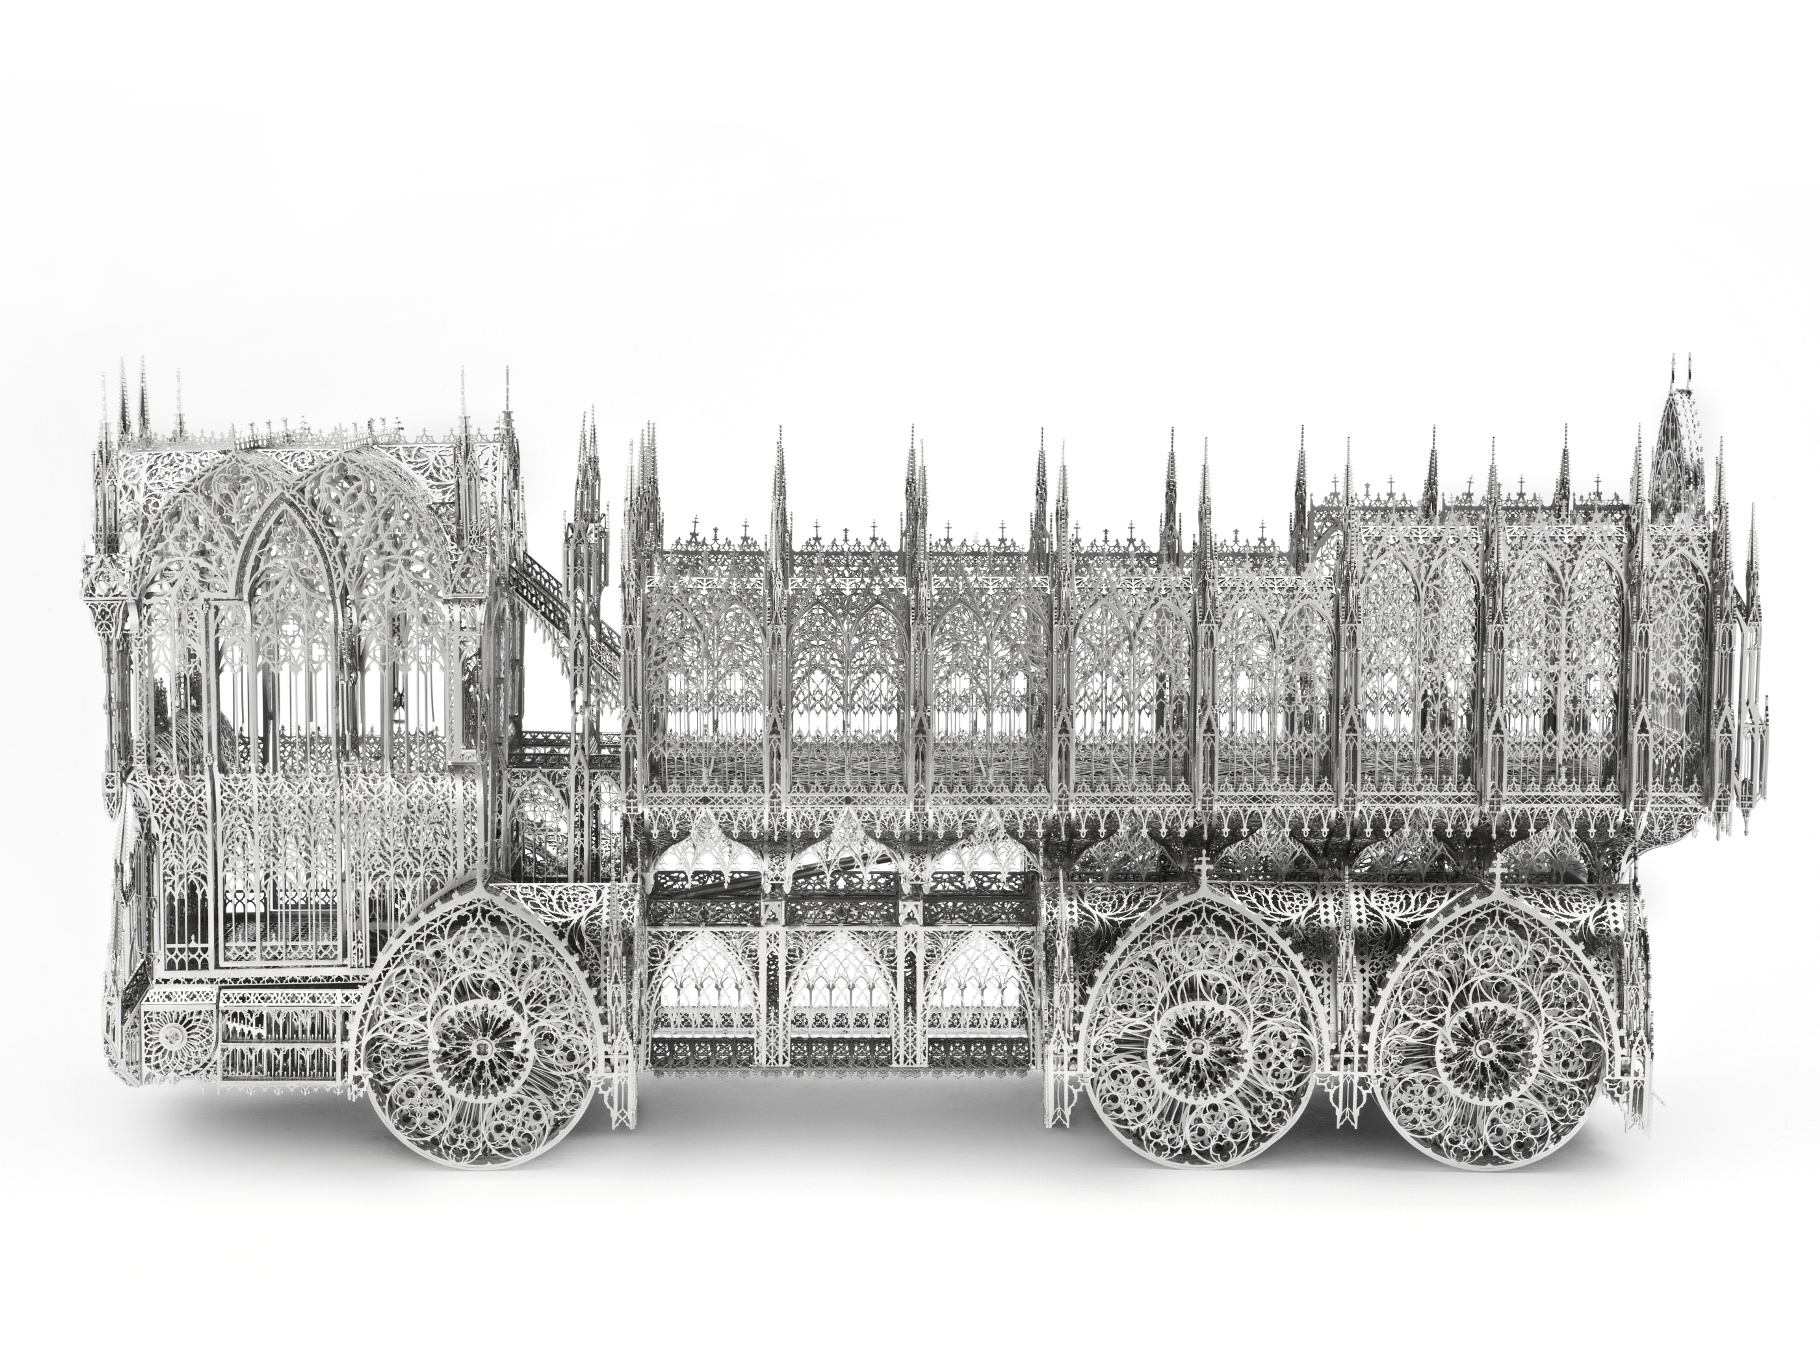 Wim Delvoye, Dumptruck, 2011, L 117 X 38 X H 56 cm, laser cut stainless steel